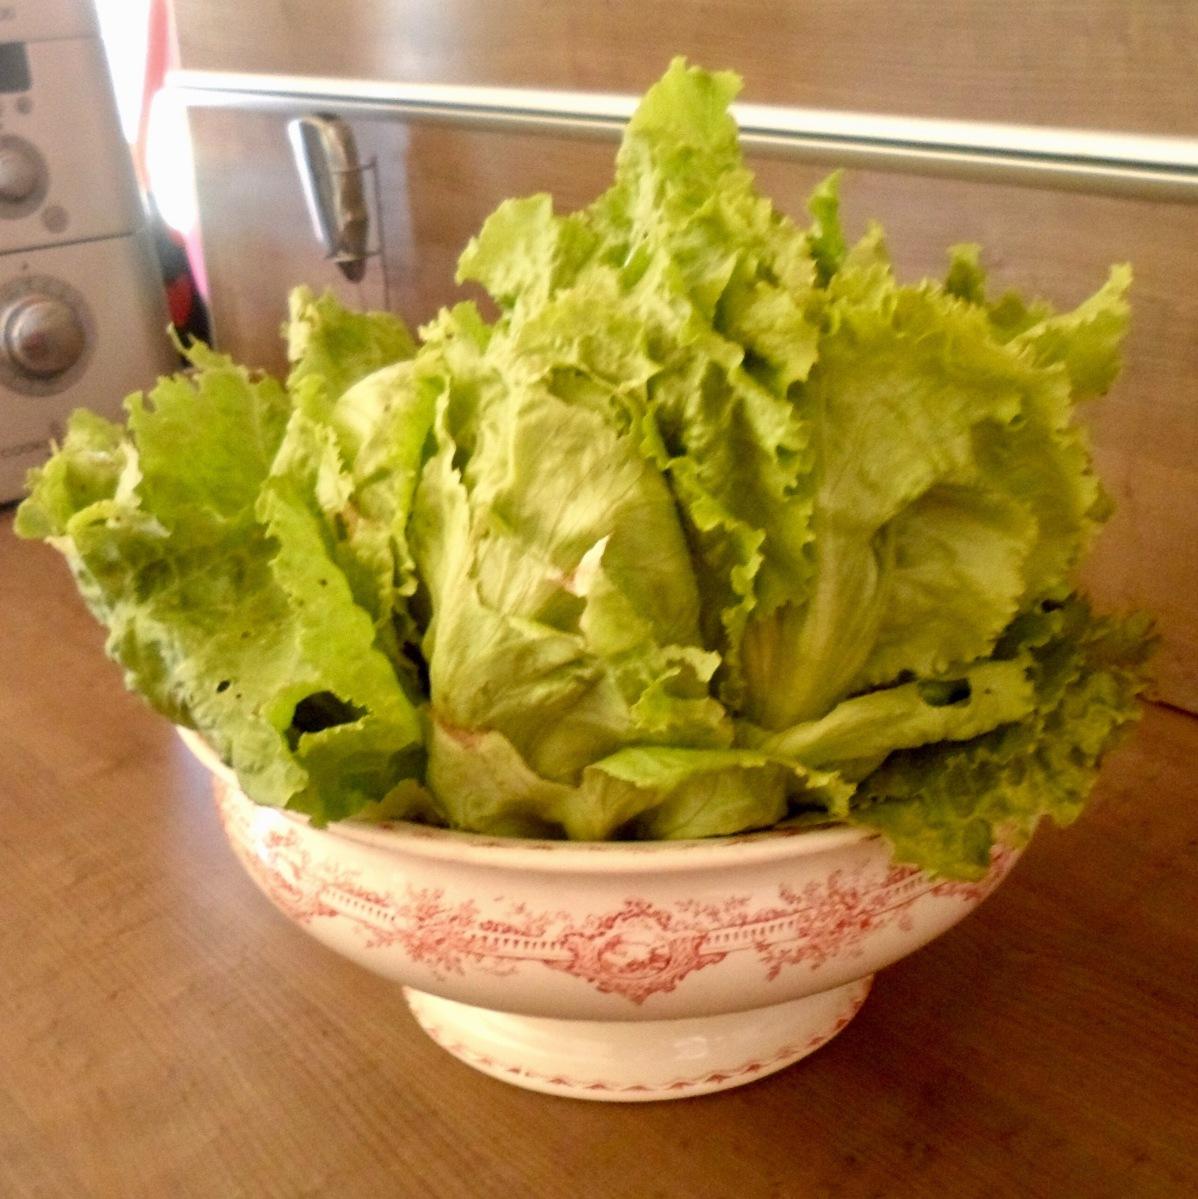 Astuce : Garder une Salade Fraîche!